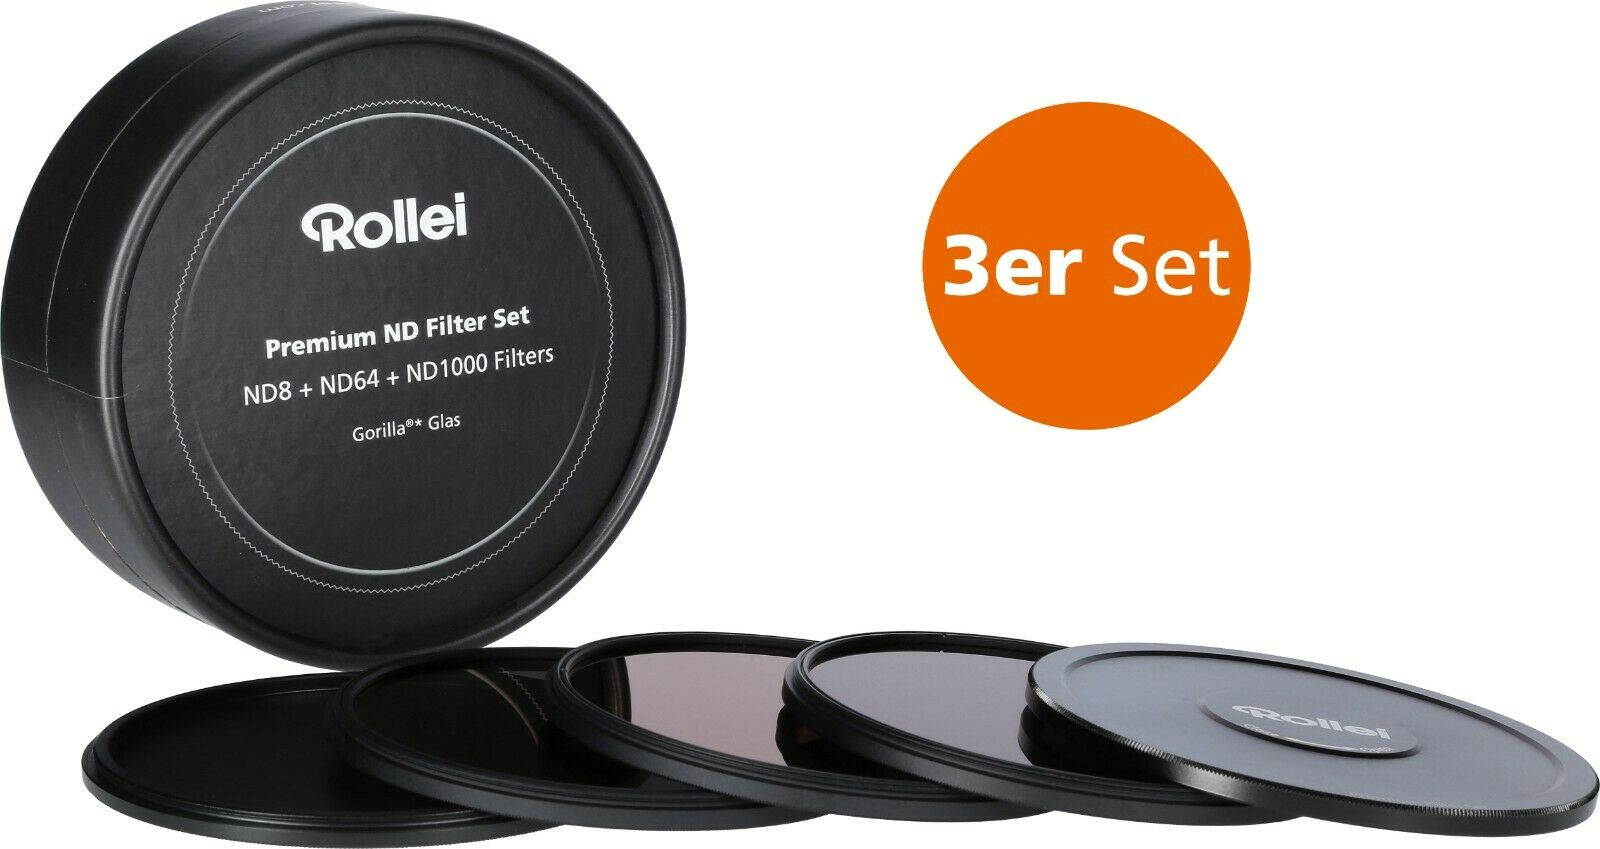 Rollei Graufilter Set (ND8 / ND64 / ND1000) Premium